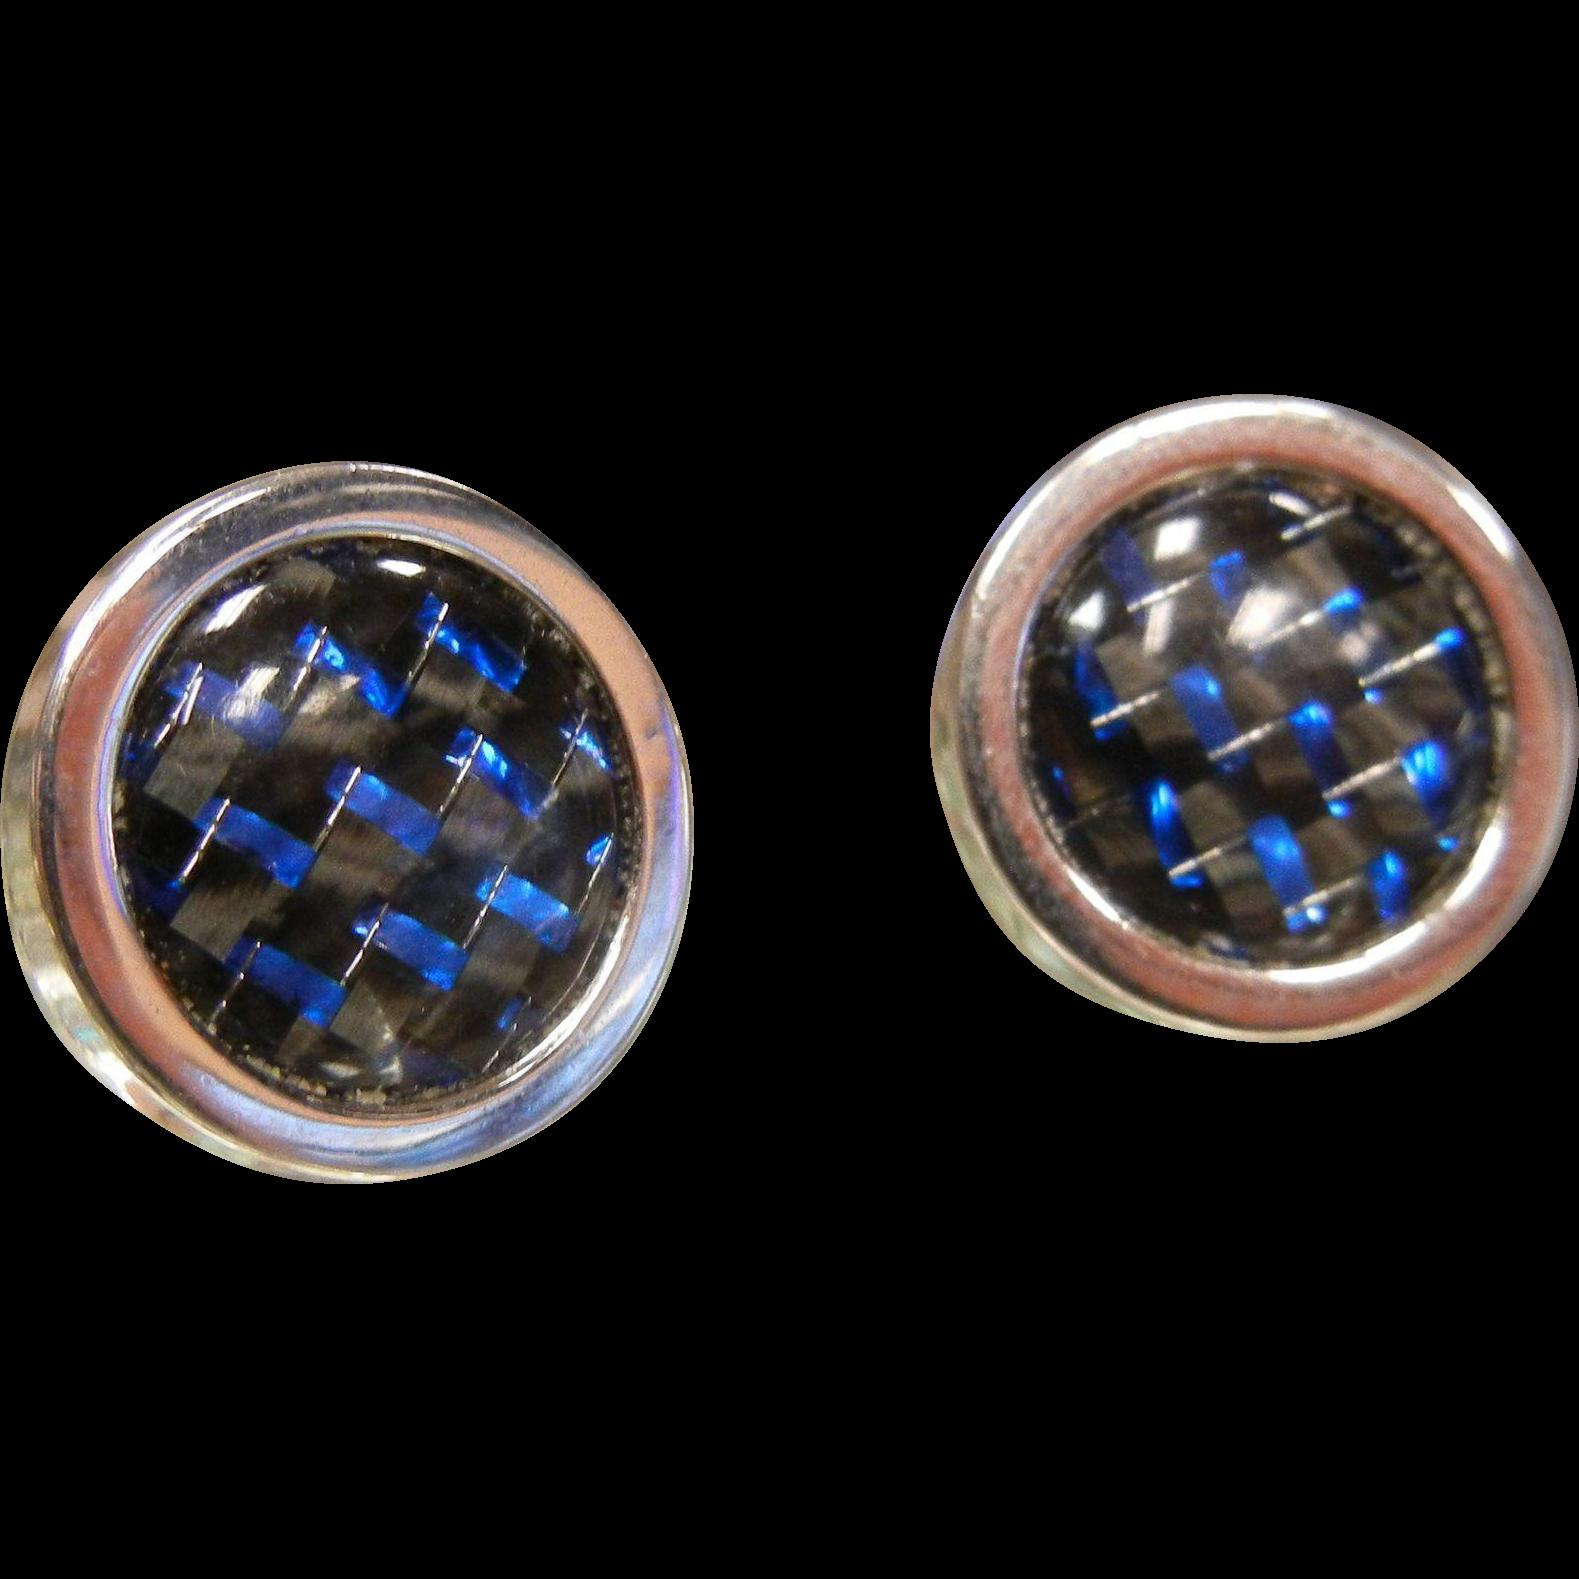 Vintage Silver-Tone Cuff Links w/ Black & Blue Accents